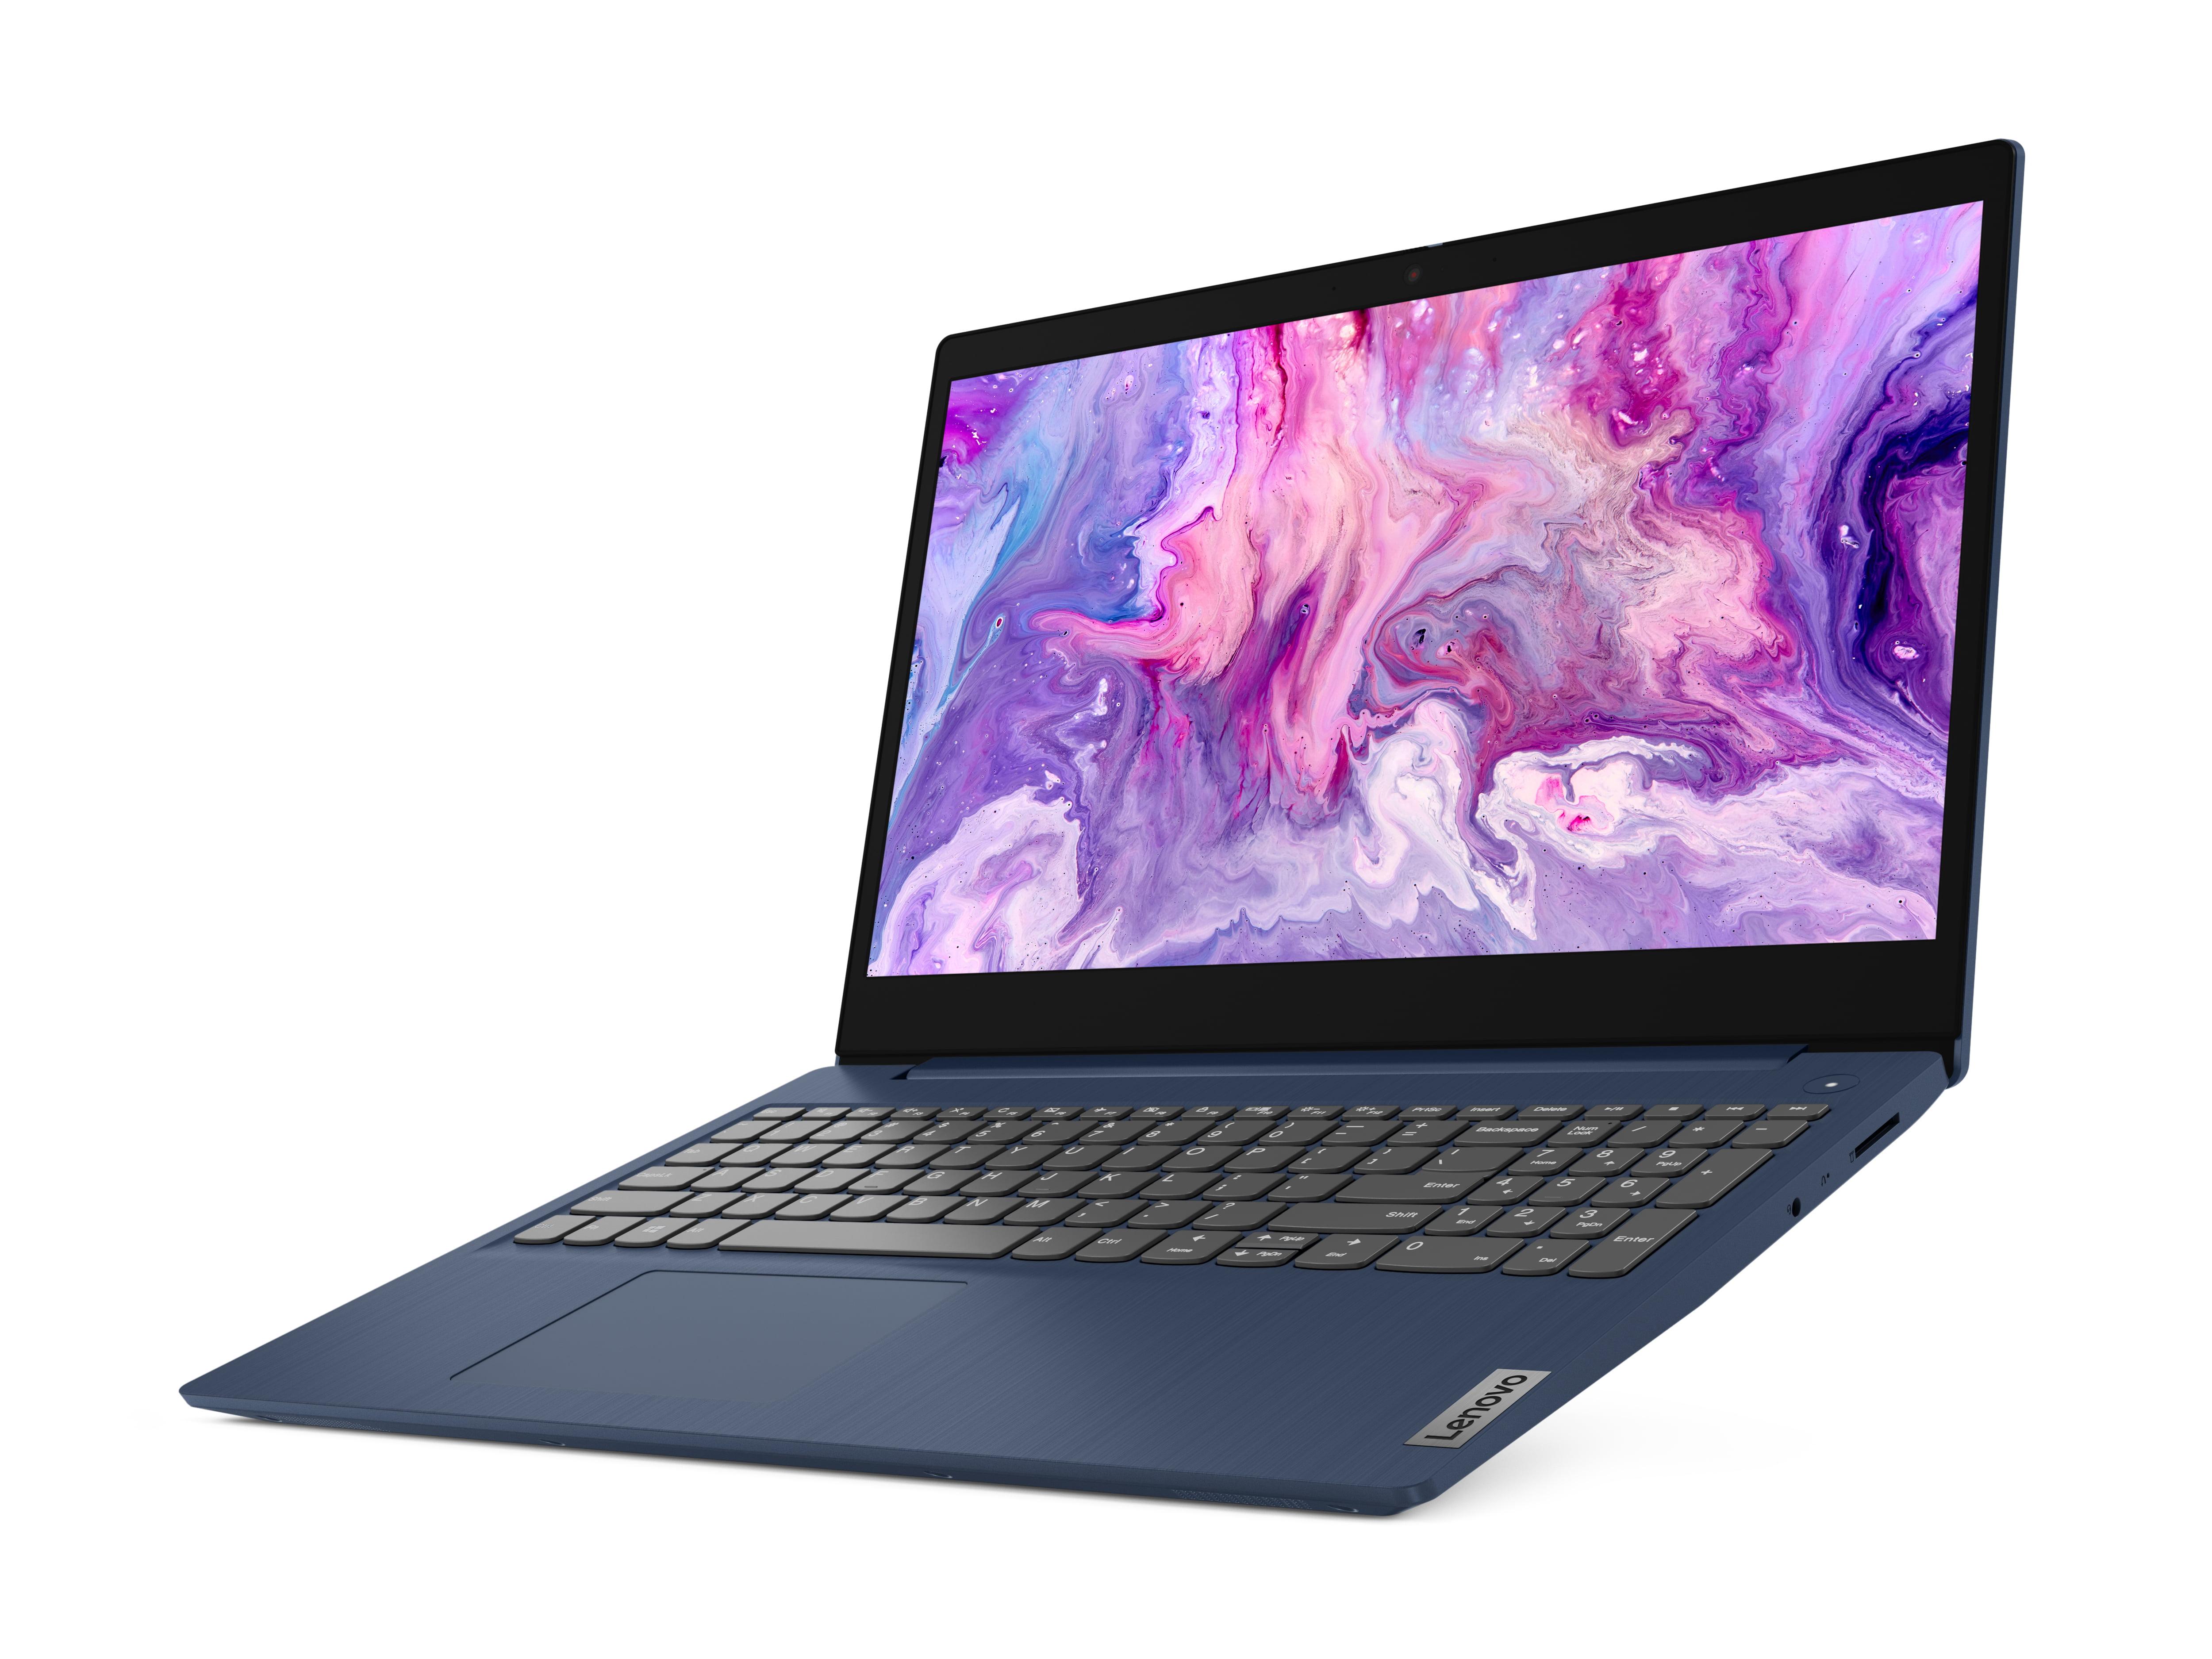 Lenovo Ideapad 3 15 Laptop Intel Core I3 1005g1 Dual Core